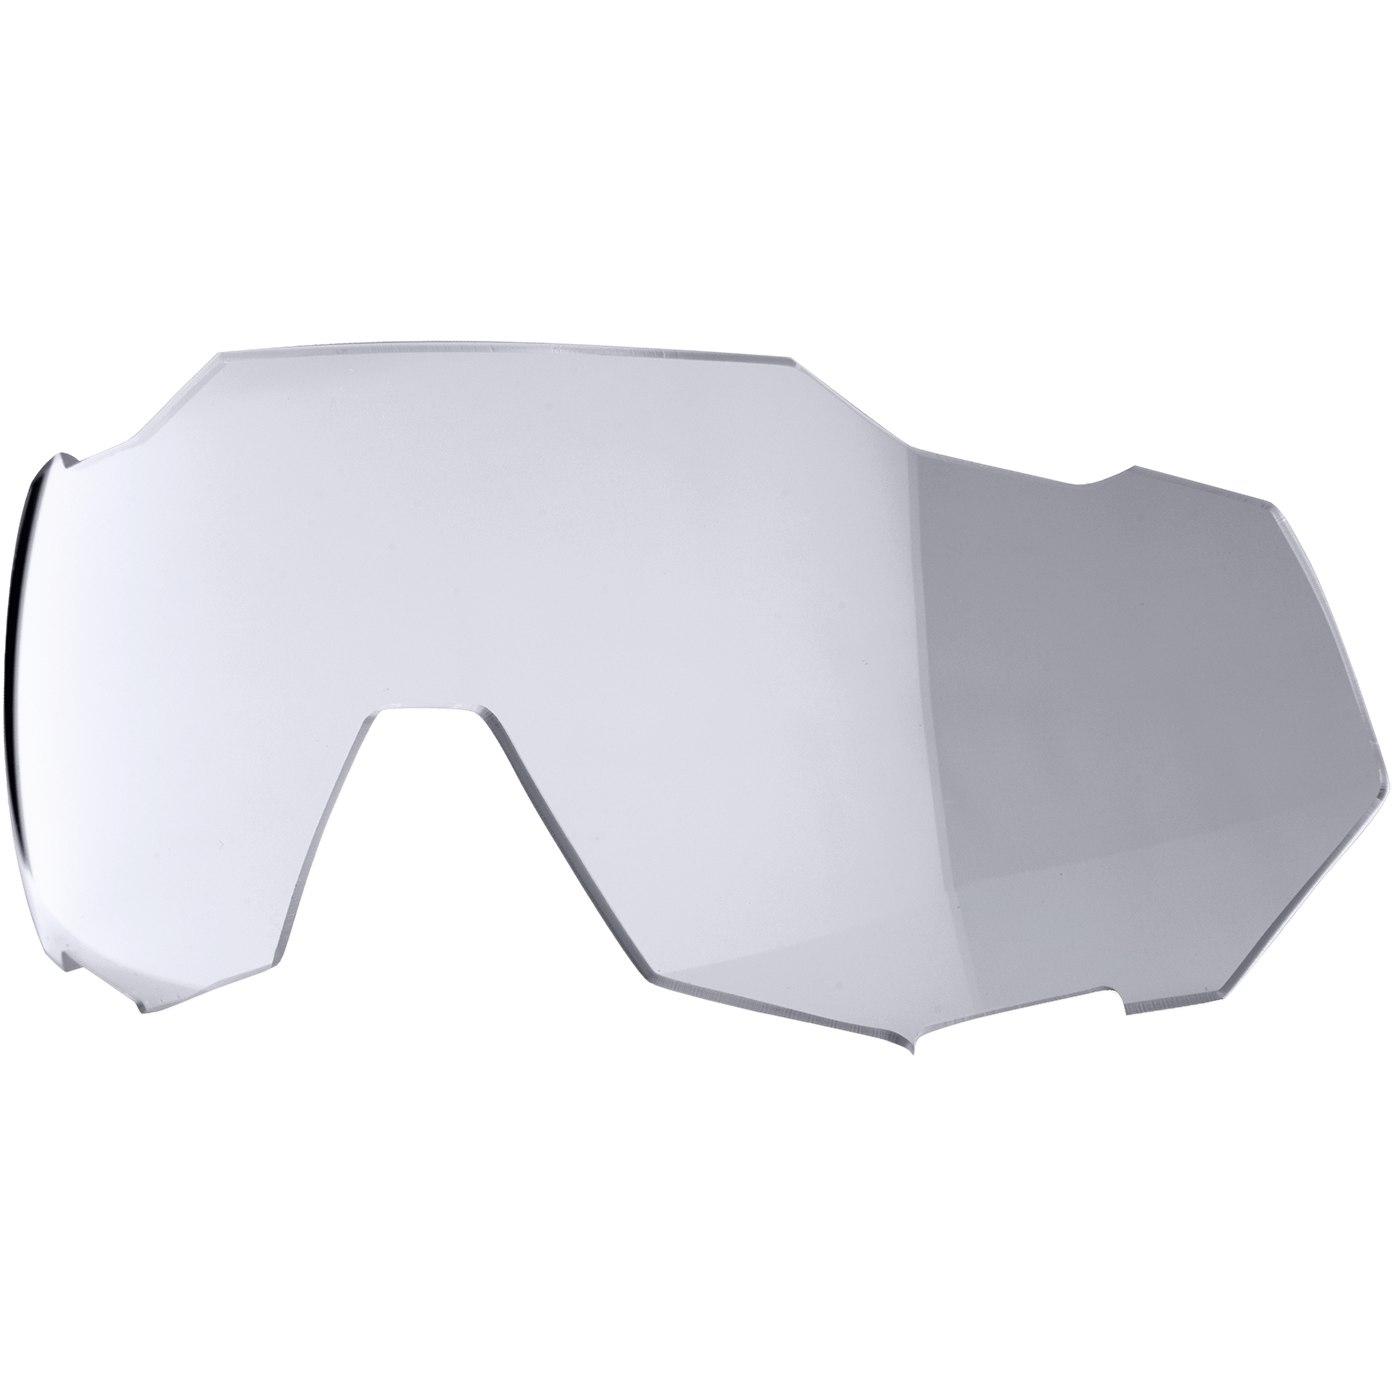 Imagen de 100% Speedtrap HiPER Mirror Replacement Lens - HiPER Silver Mirror